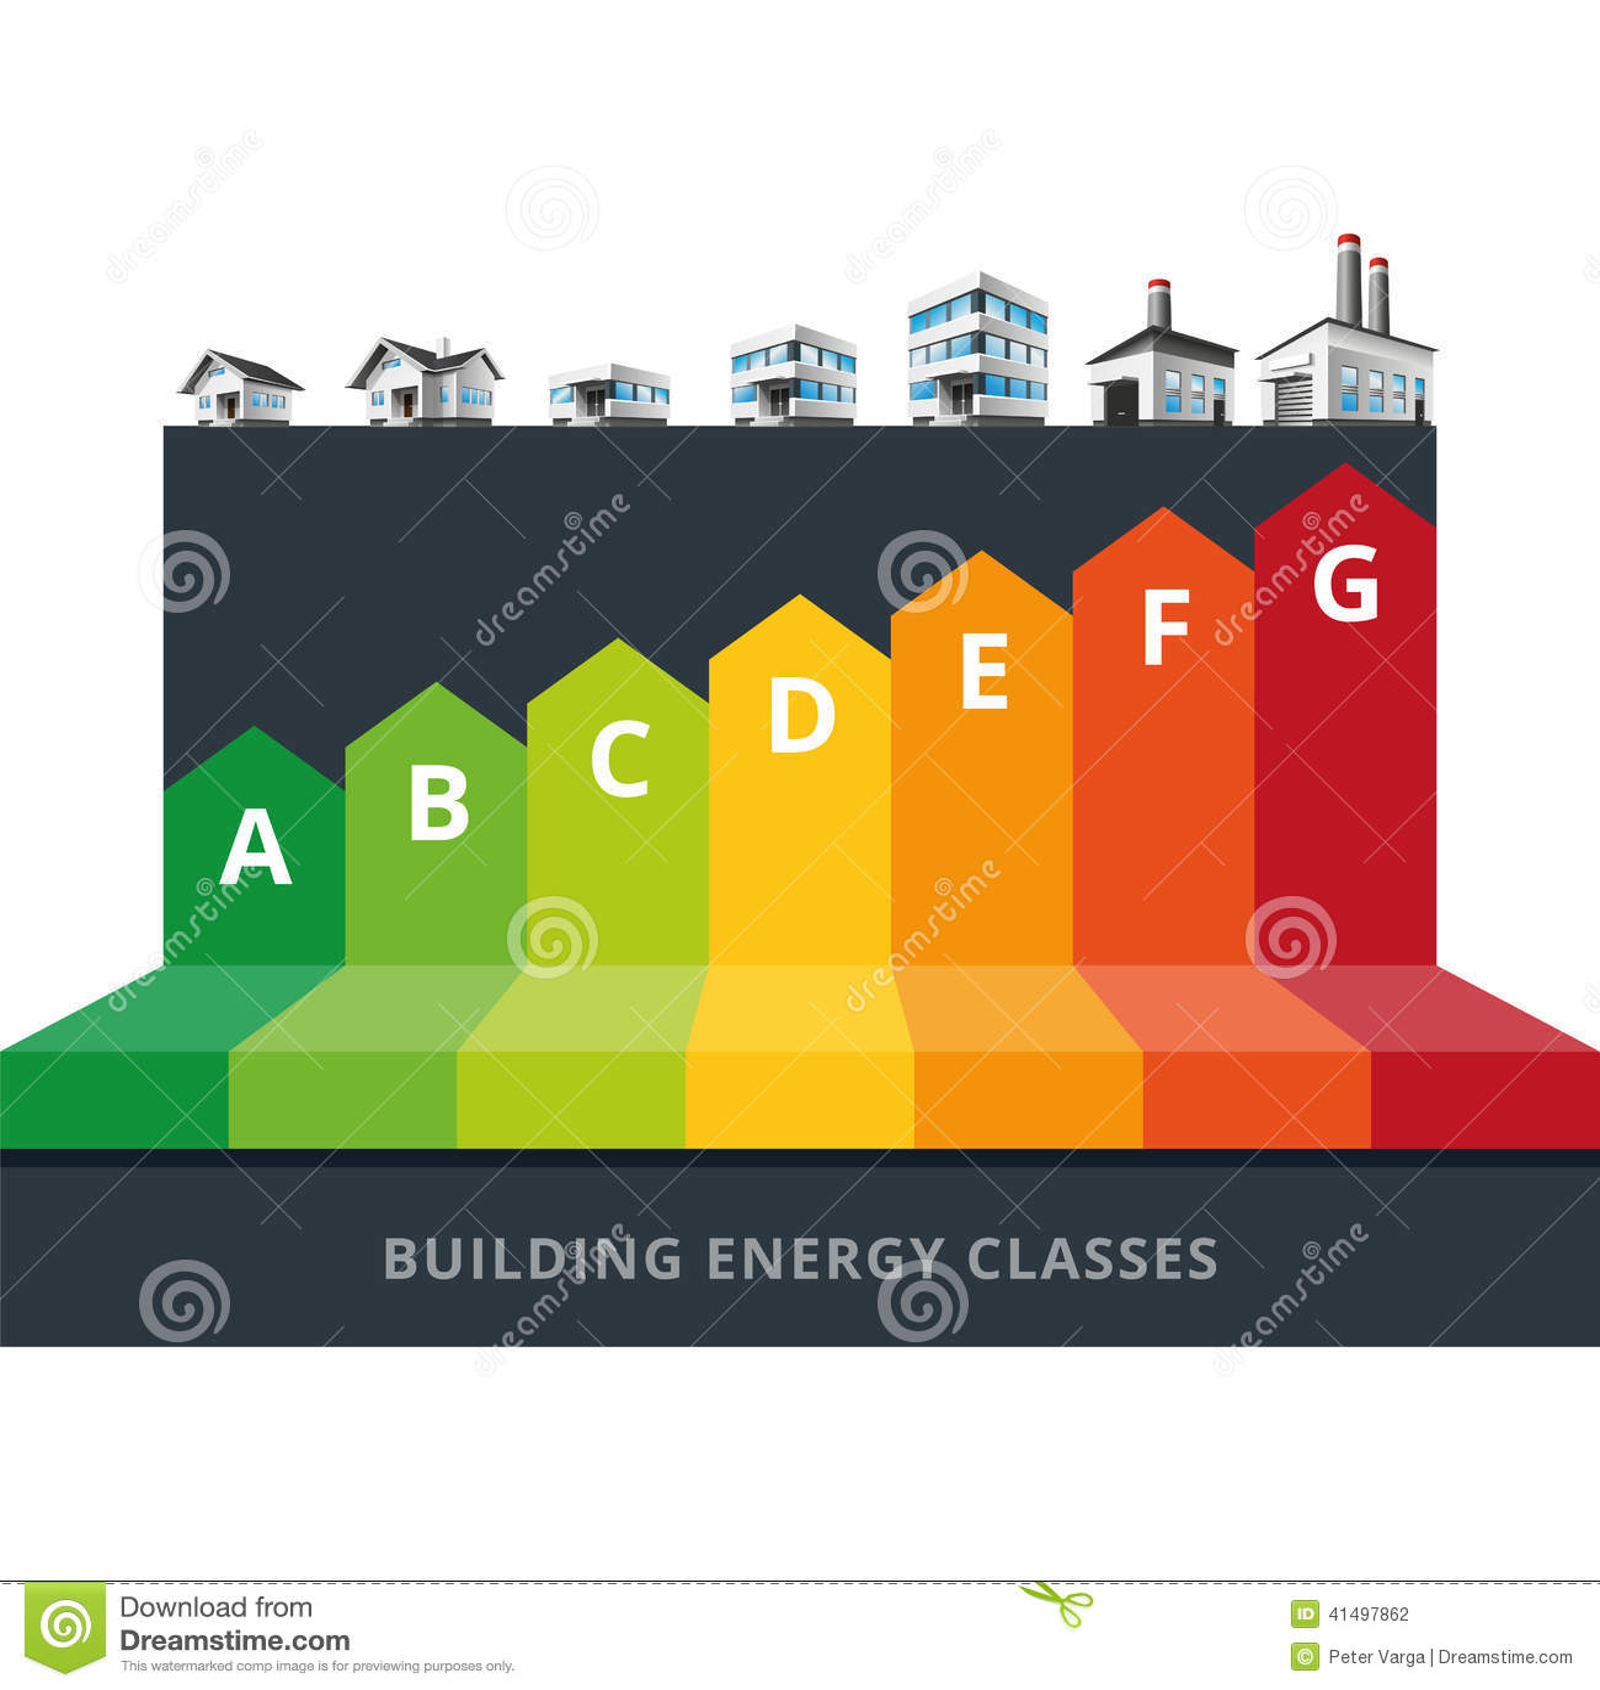 Efficiency Classes Label